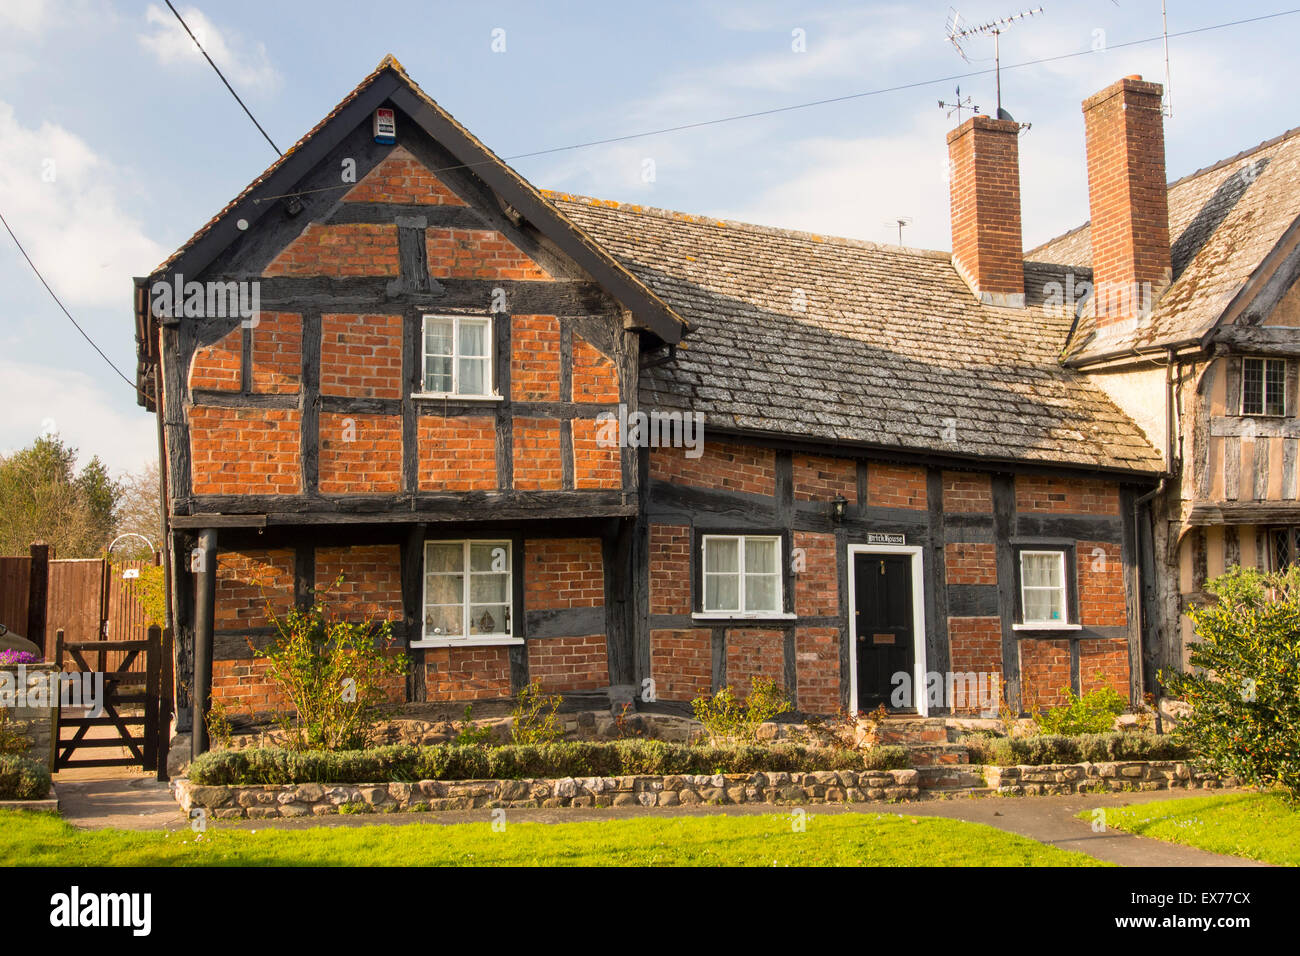 Tudor Timber Framed Houses Stock Photos & Tudor Timber Framed Houses ...